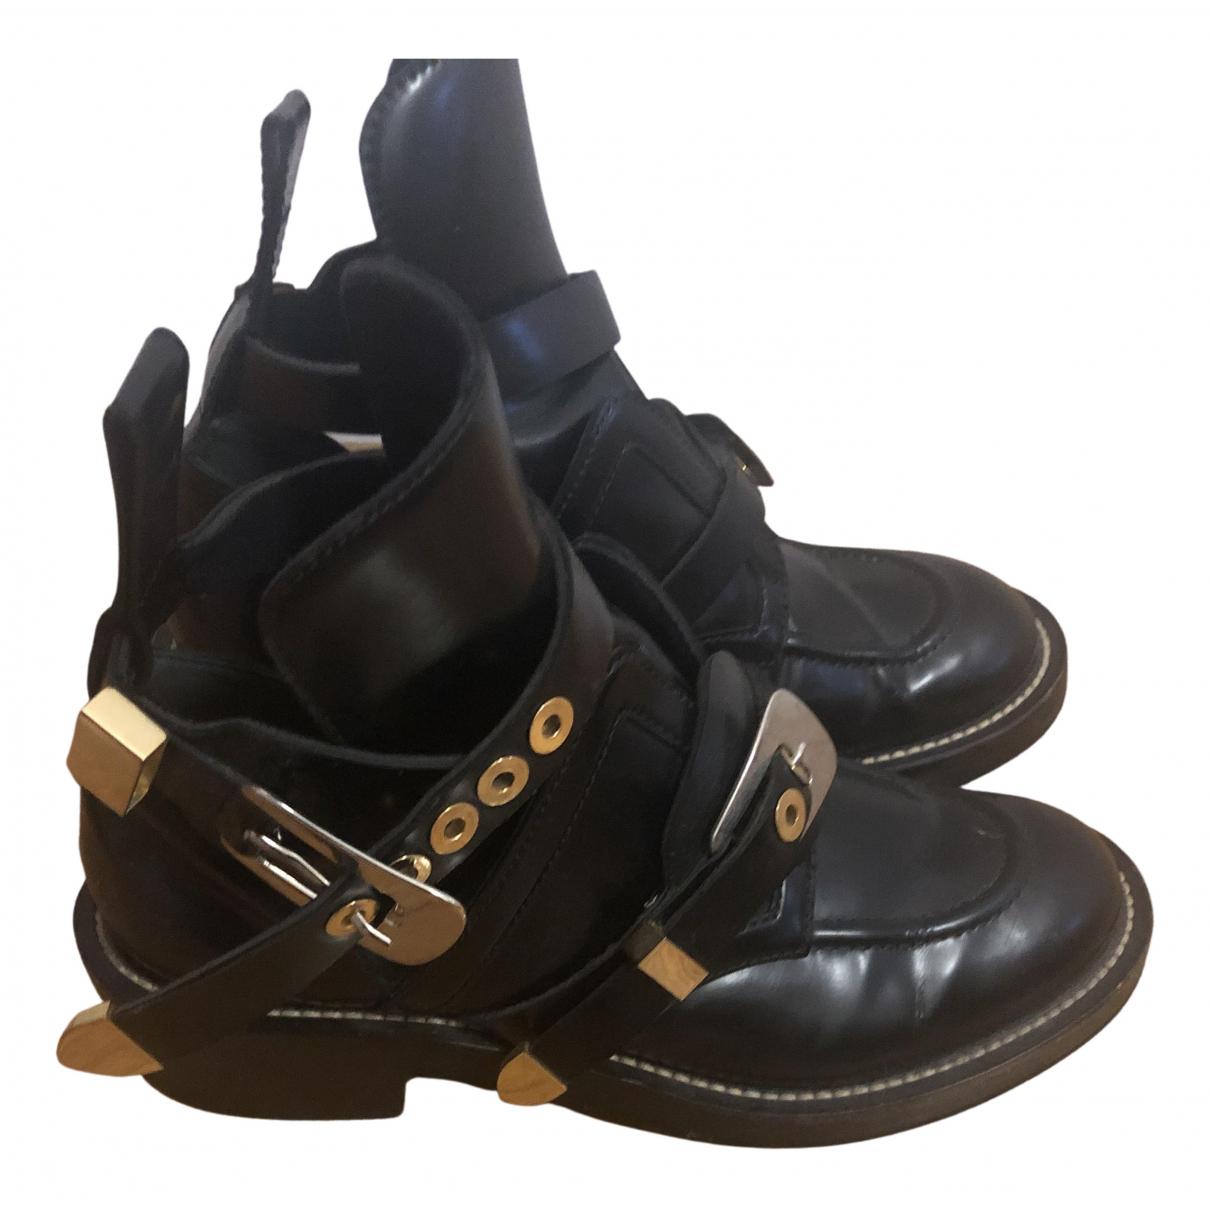 Balenciaga Ceinture Black Leather Ankle boots for Women 40 EU